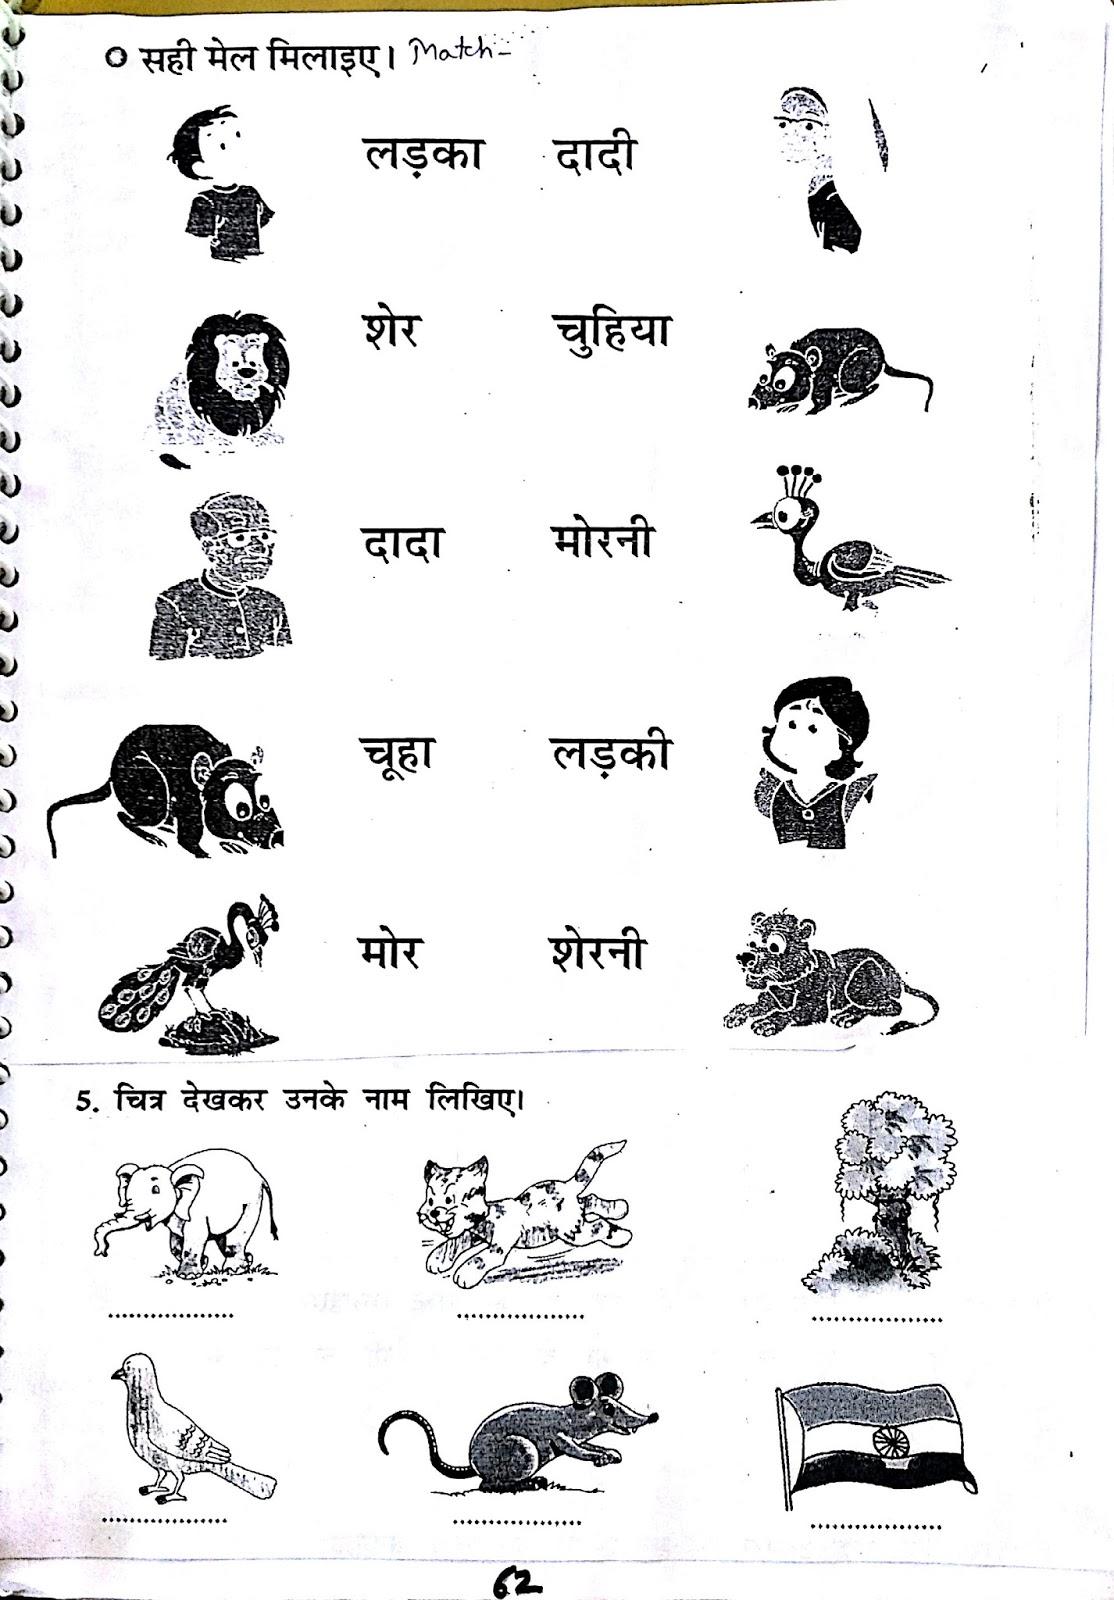 Hindi Worksheet Z